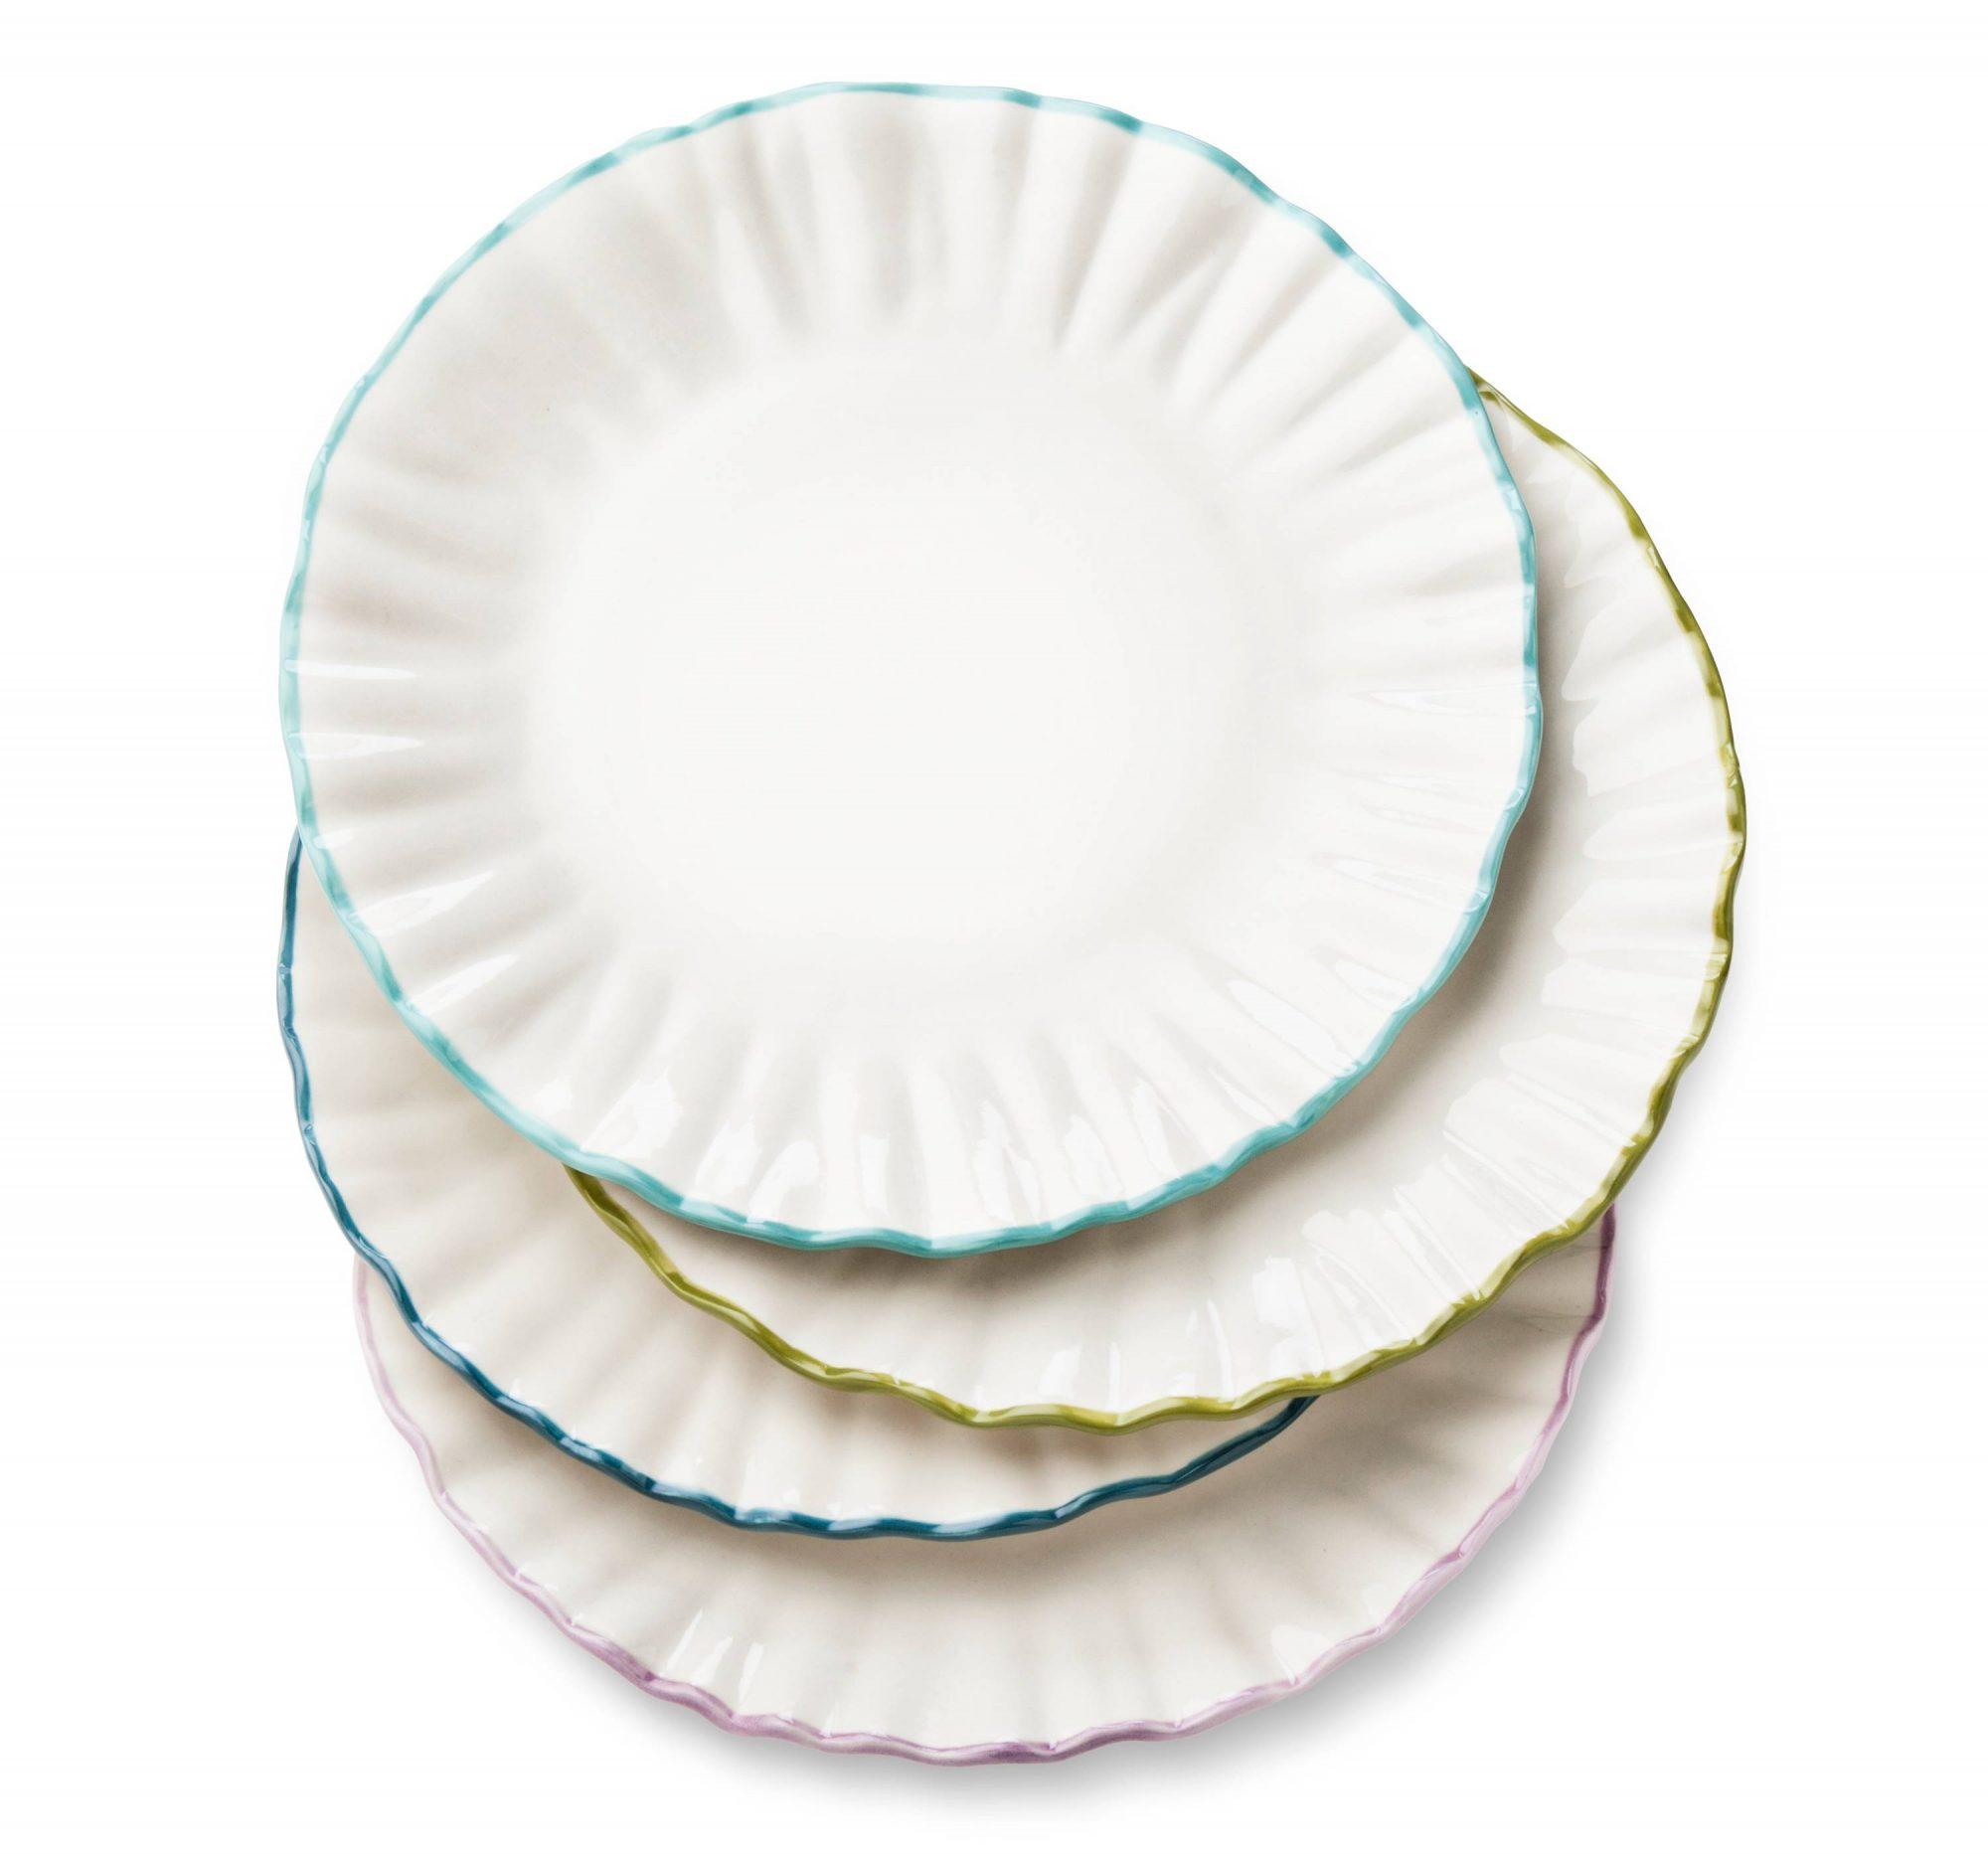 Stoneware Dinner Plate Target.jpeg